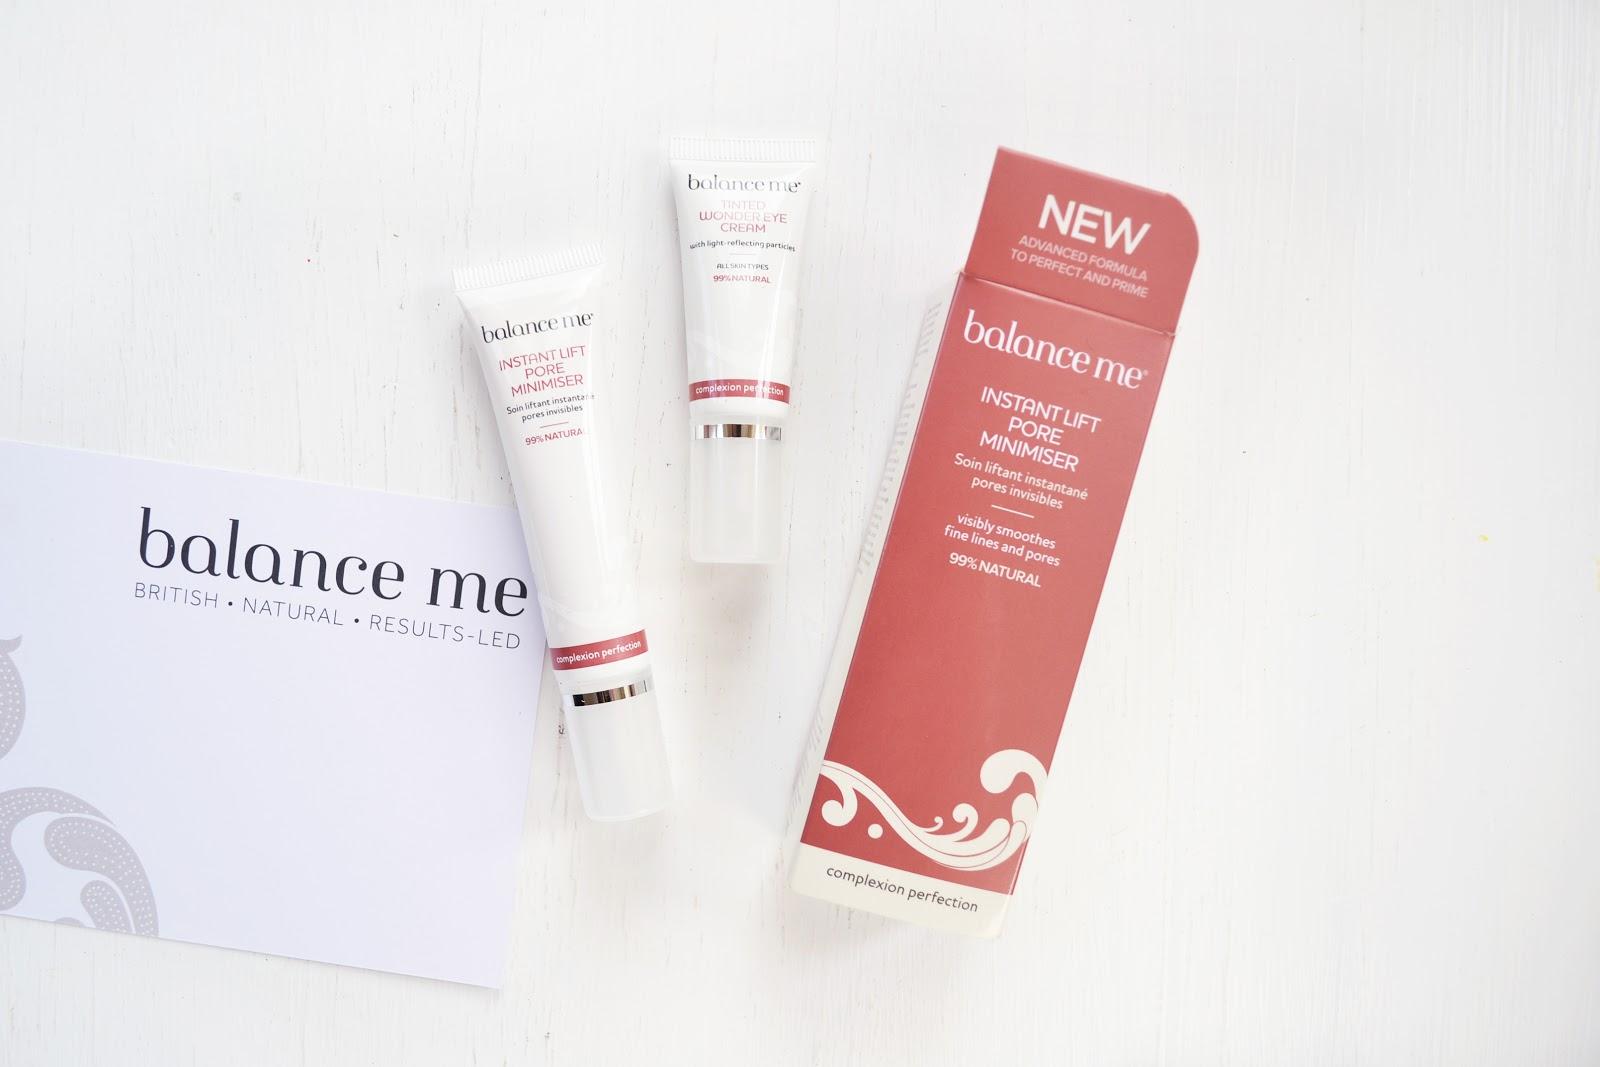 balance me skincare, balance me pore minimiser, balance me tinted wonder eye cream